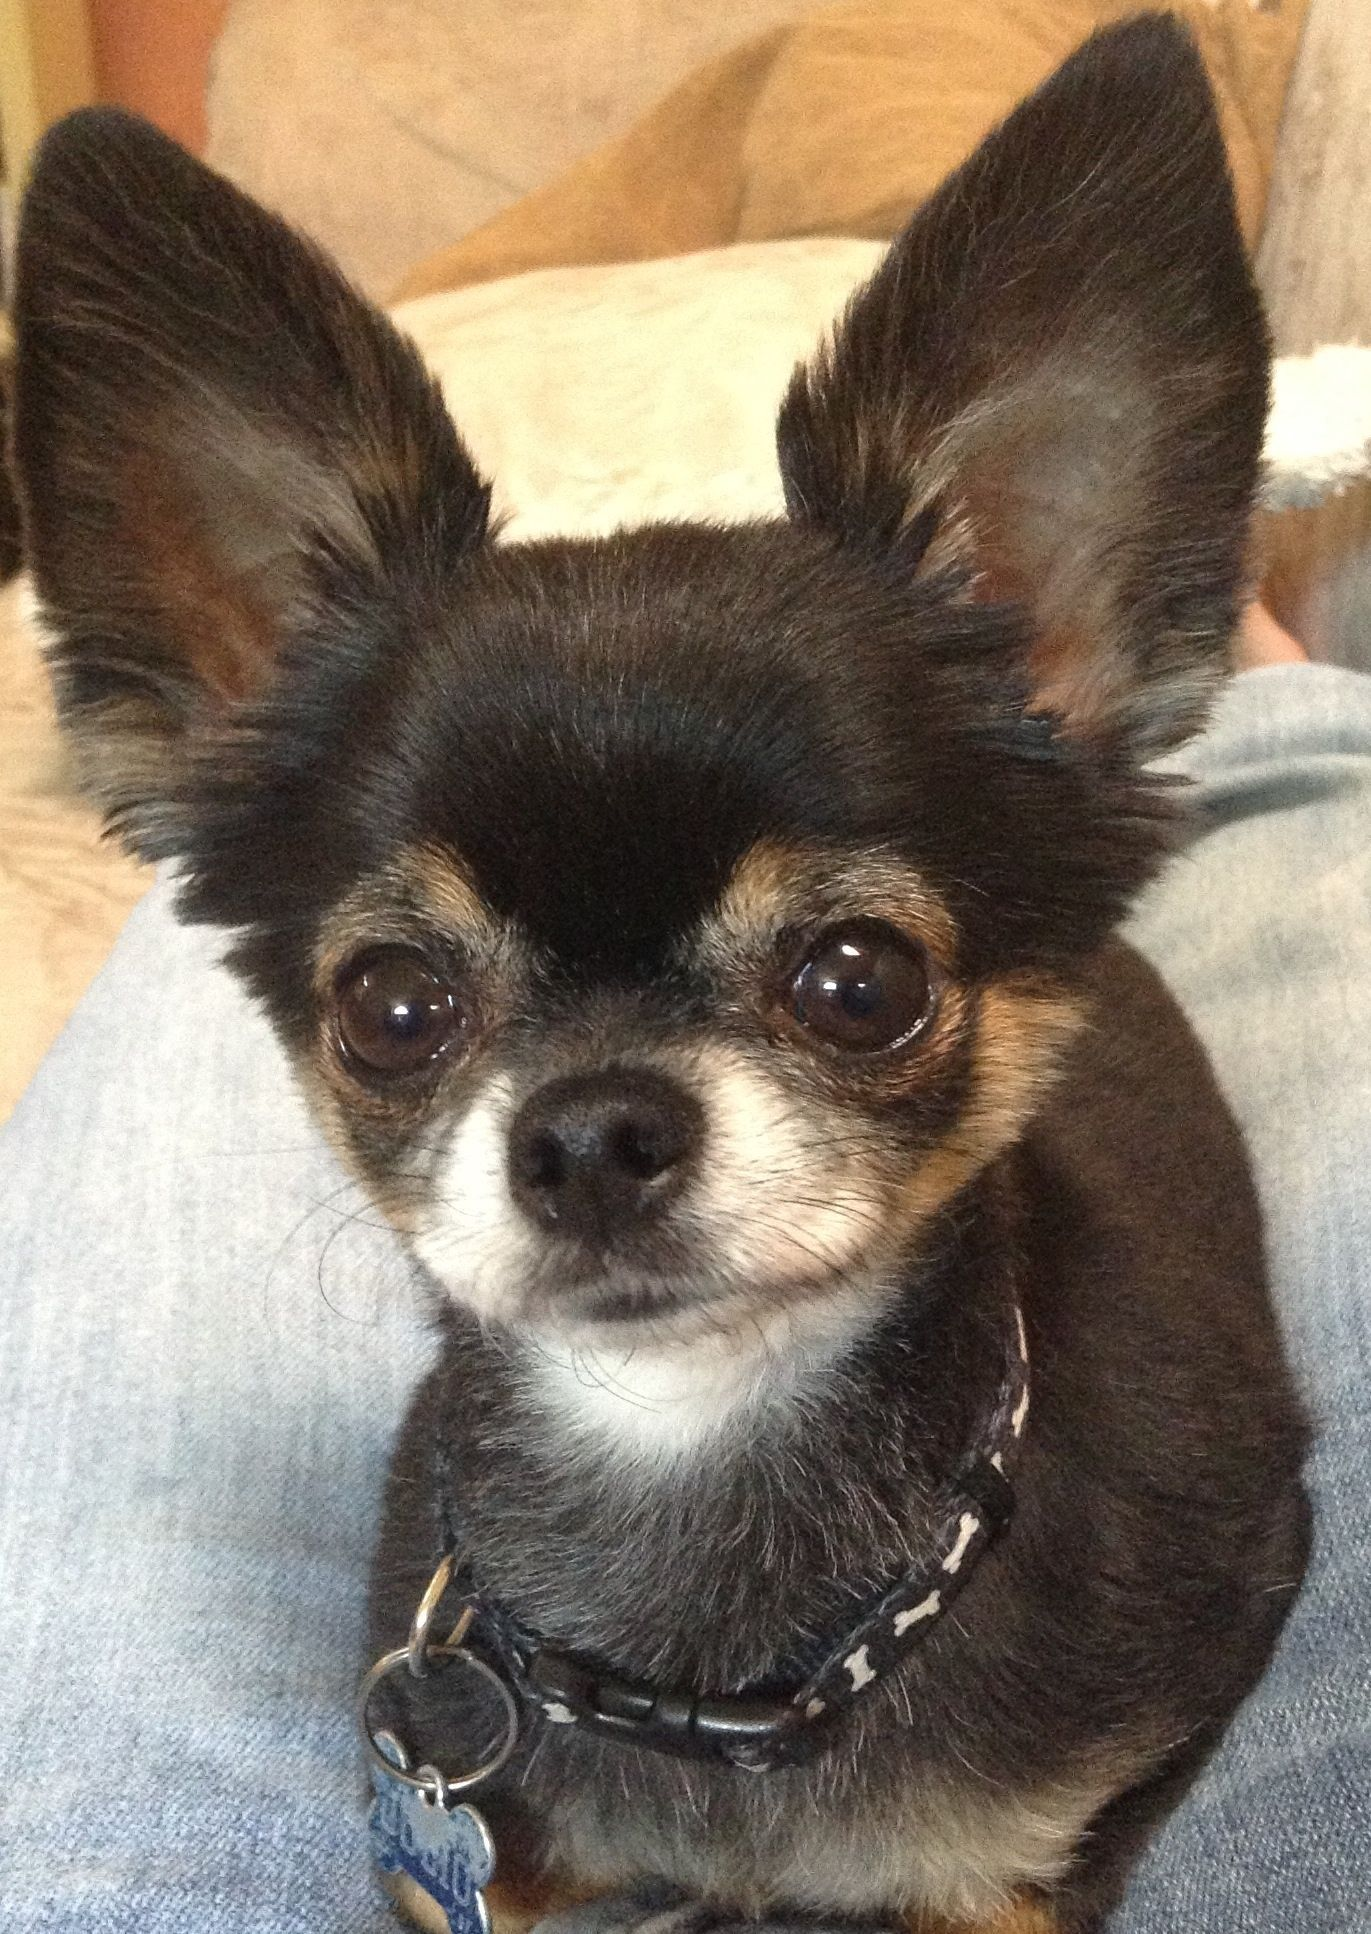 Chihuahua Beauty What Big Ears You Have Chihuahua Beauty What